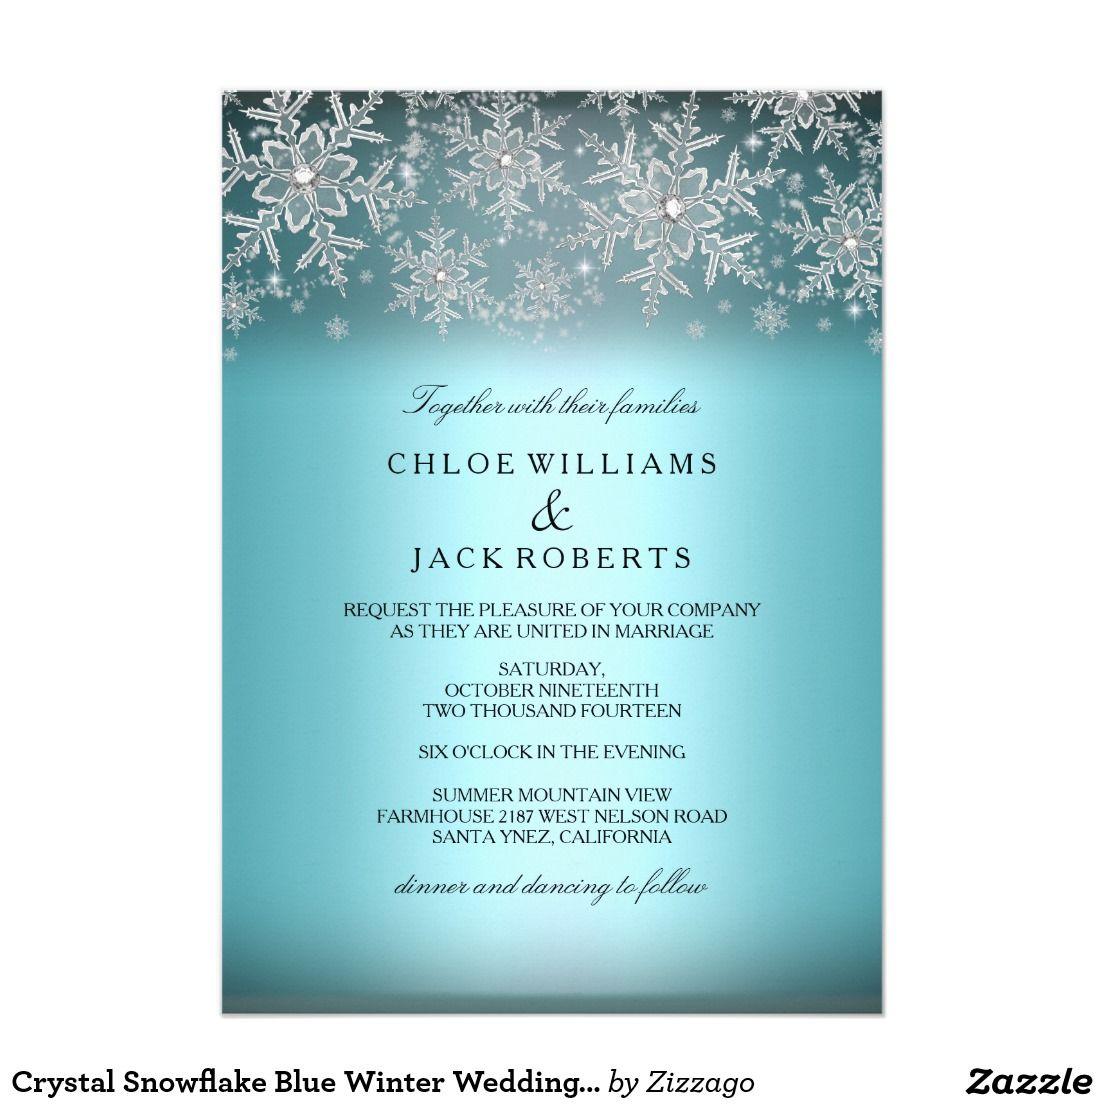 Winter Wedding Invitations Cheap: Crystal Snowflake Blue Winter Wedding Invitation